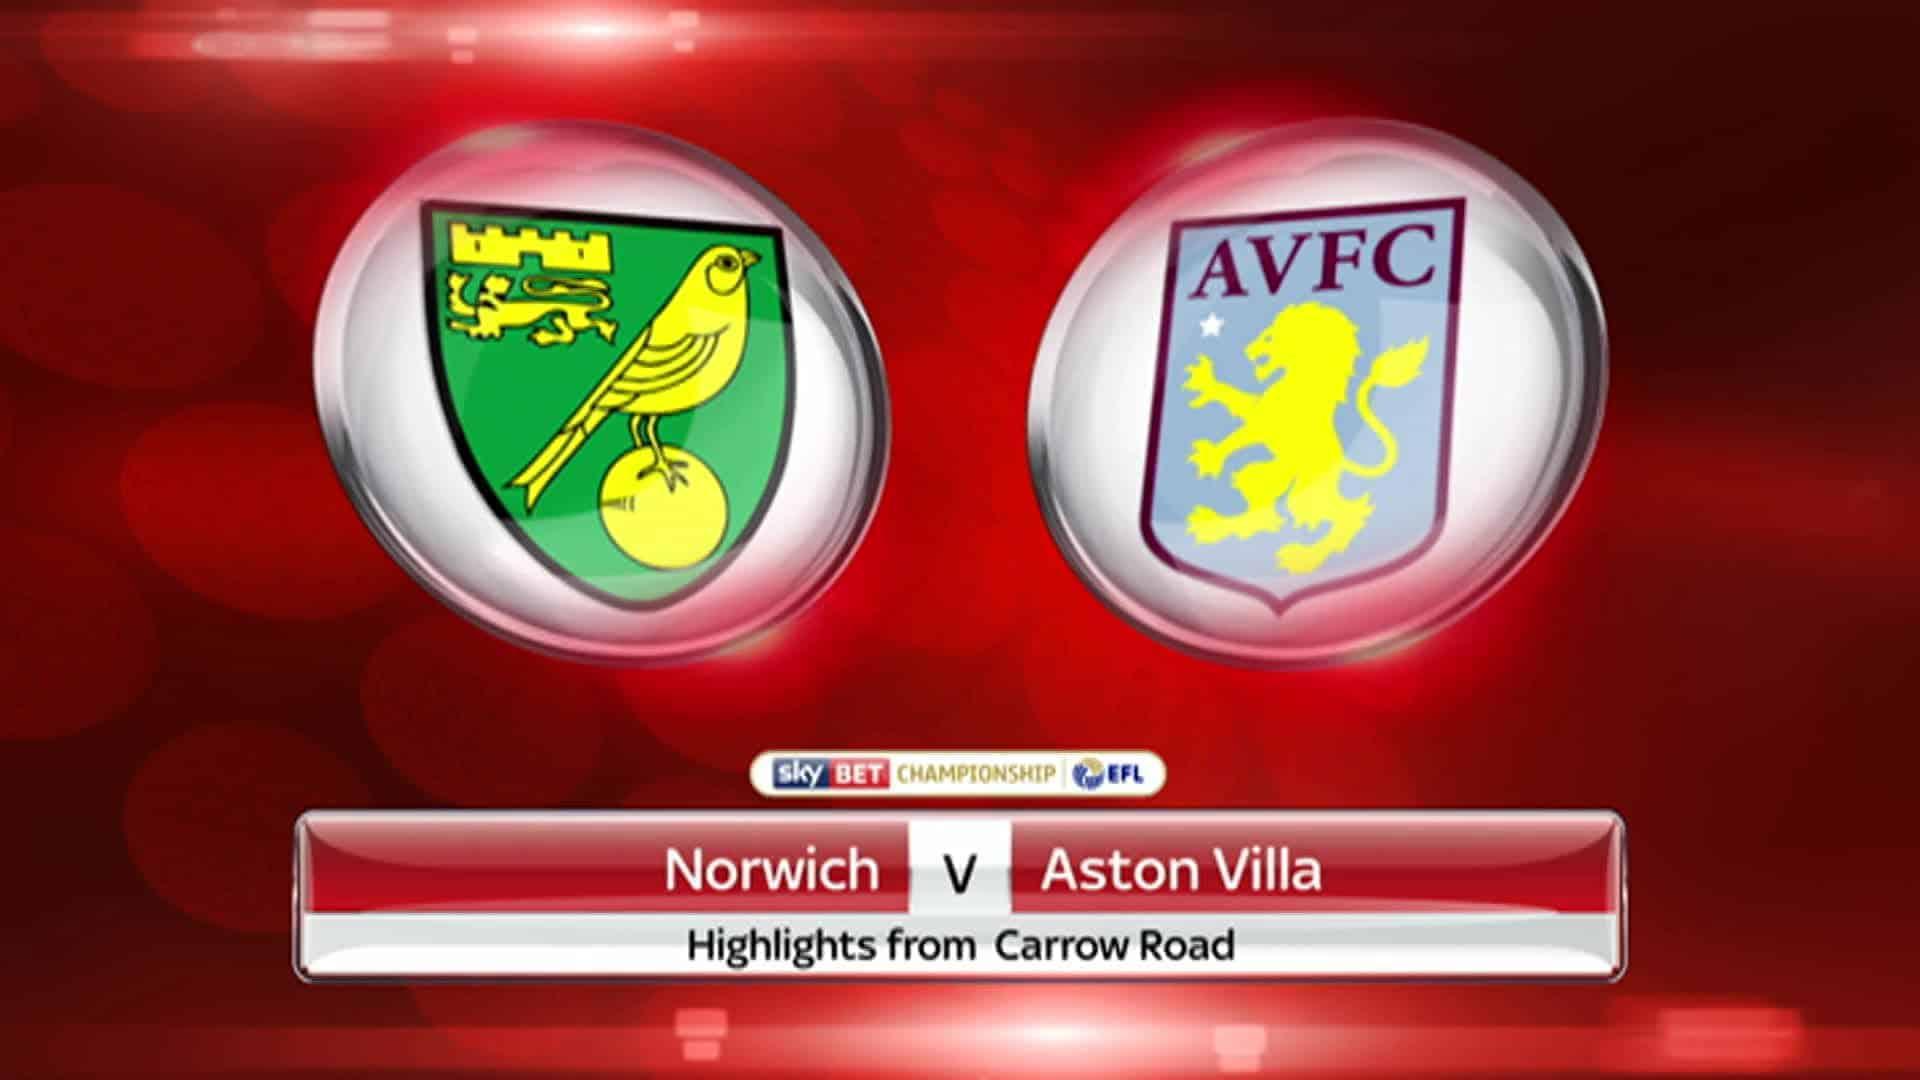 Soi kèo Norwich vs Aston Villa, 05/10/2019 - Ngoại Hạng Anh